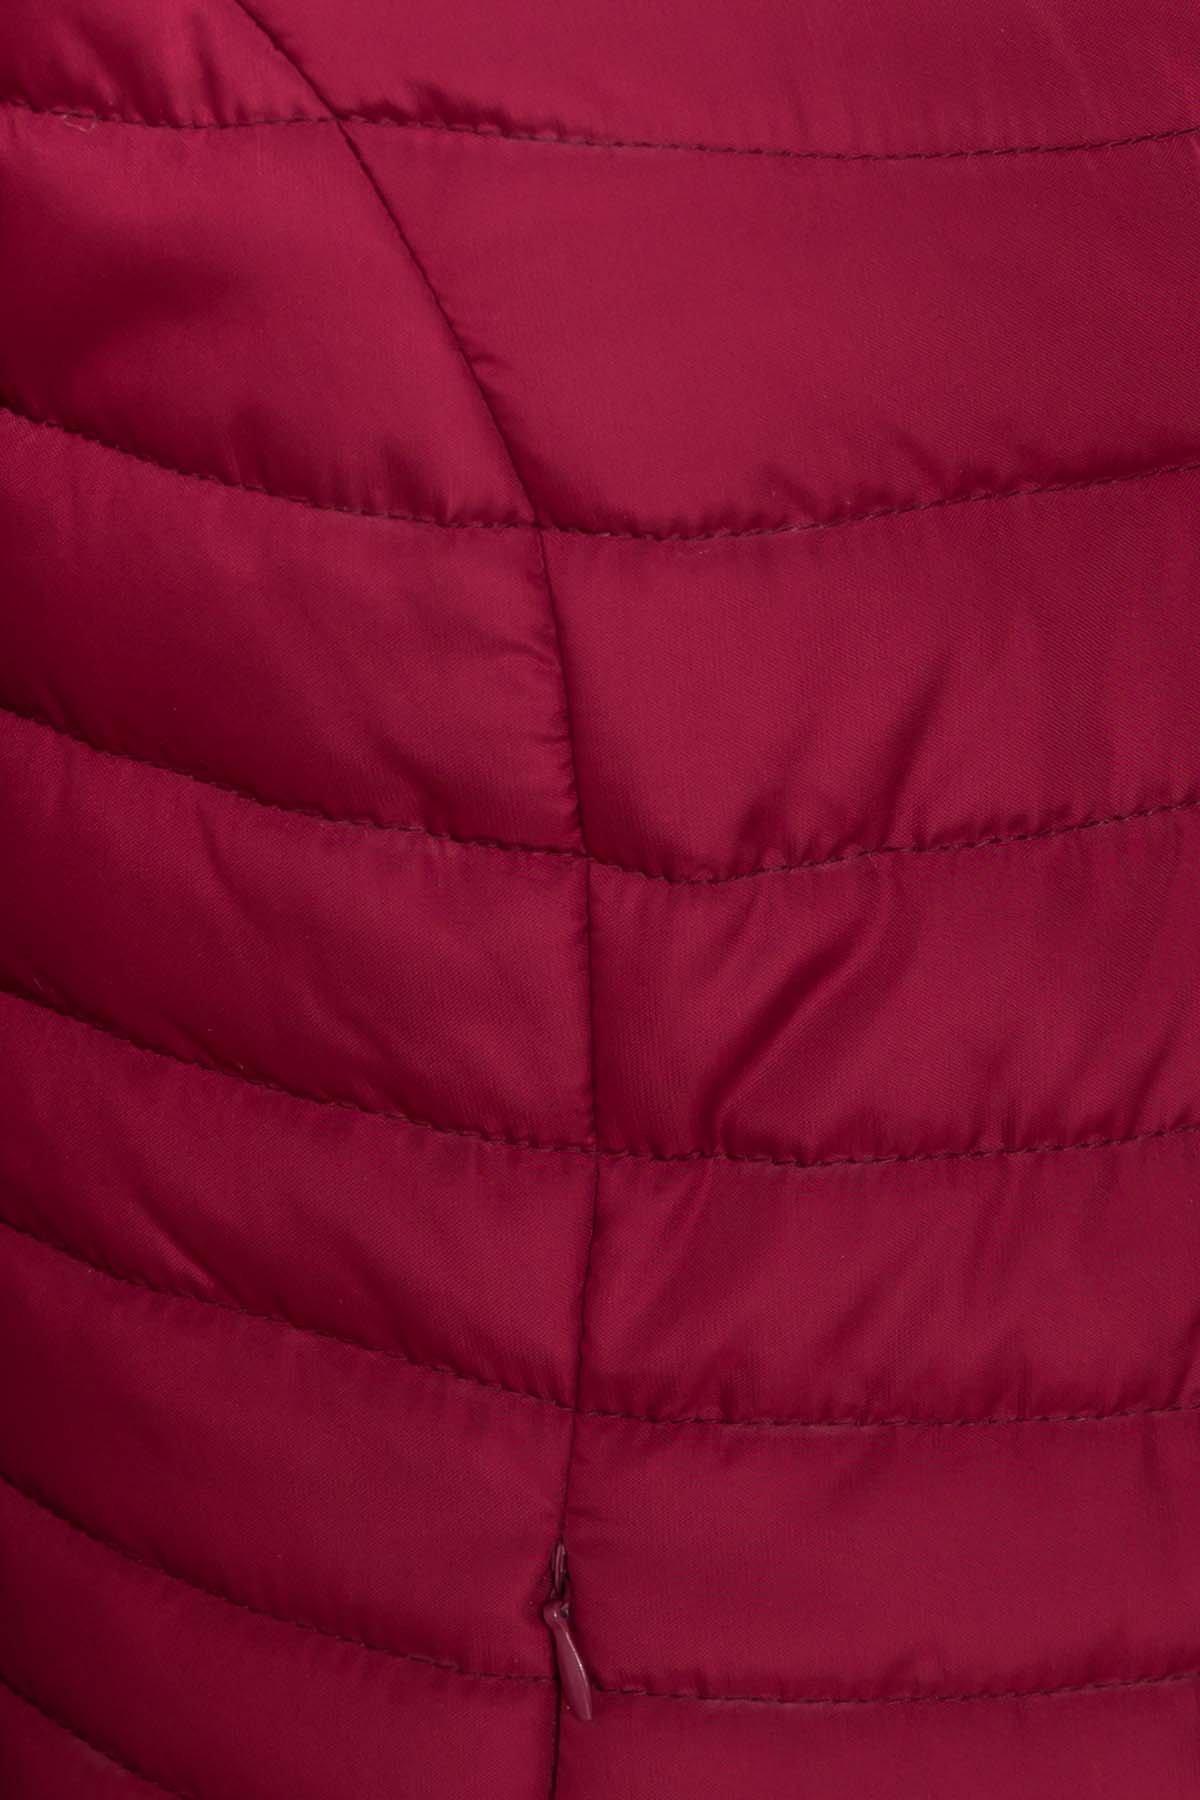 Куртка Флориса лайт 6416 АРТ. 41338 Цвет: Марсала - фото 5, интернет магазин tm-modus.ru